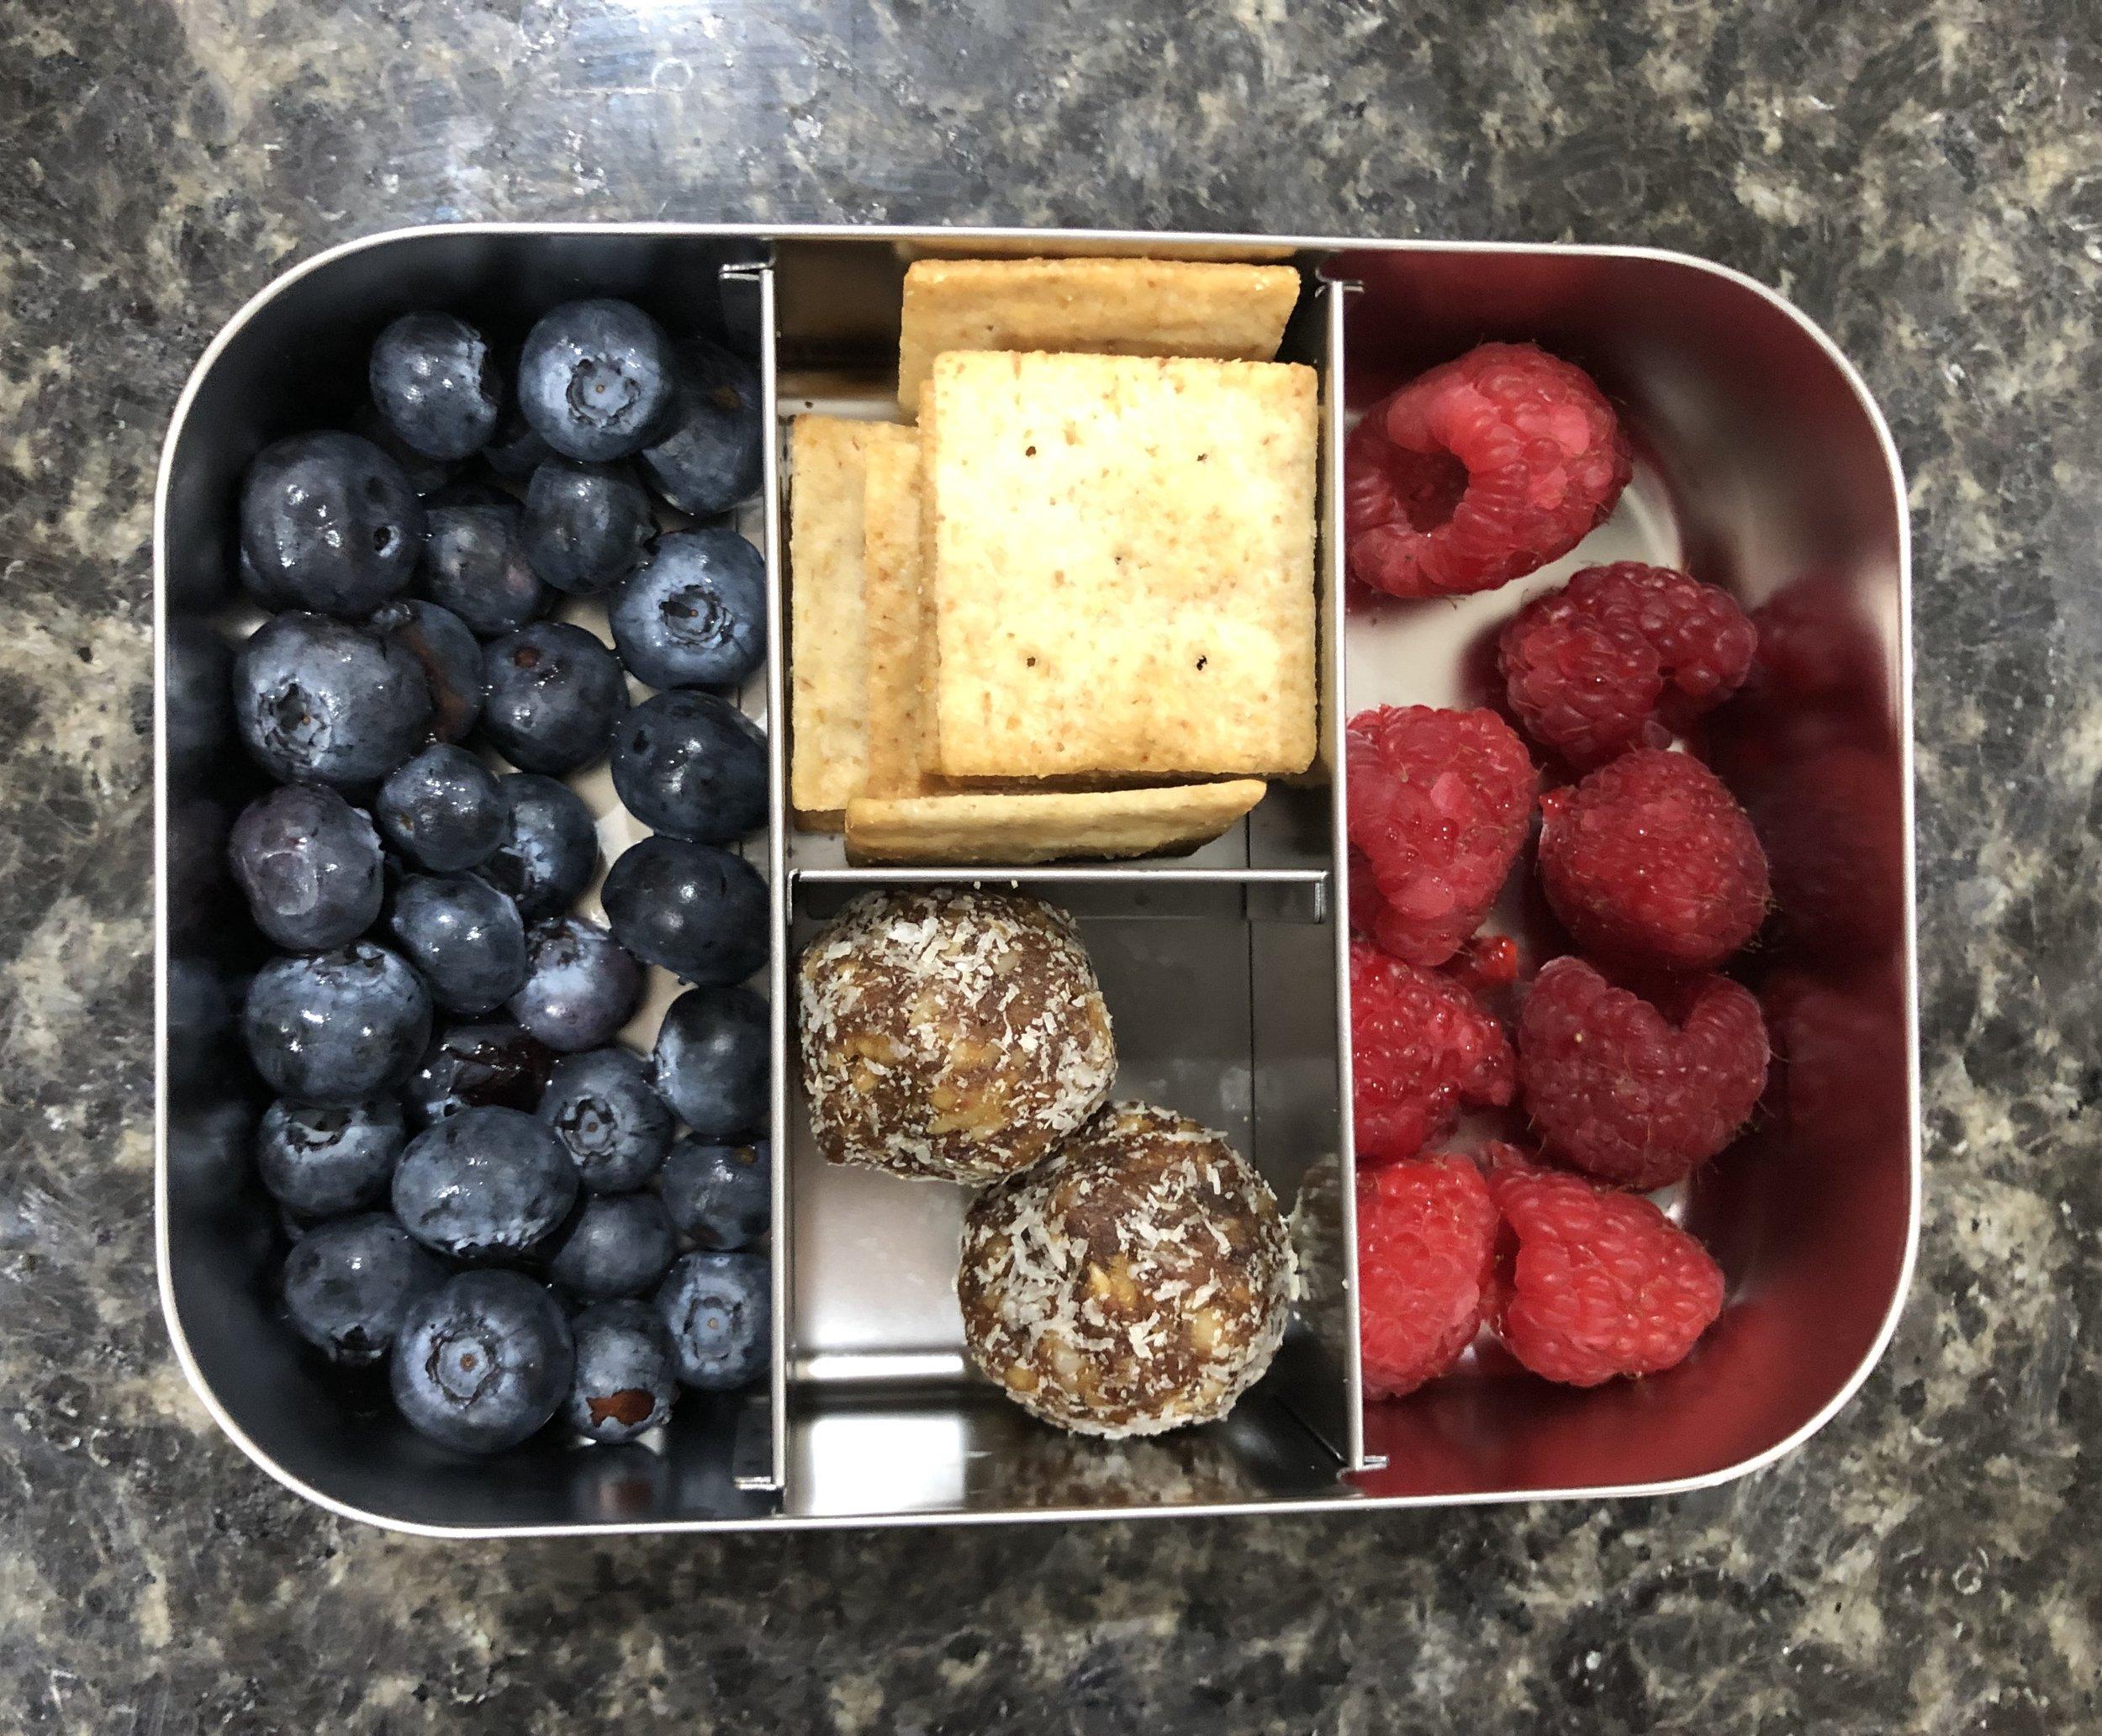 blueberries, paleo crackers, mango bites, raspberries